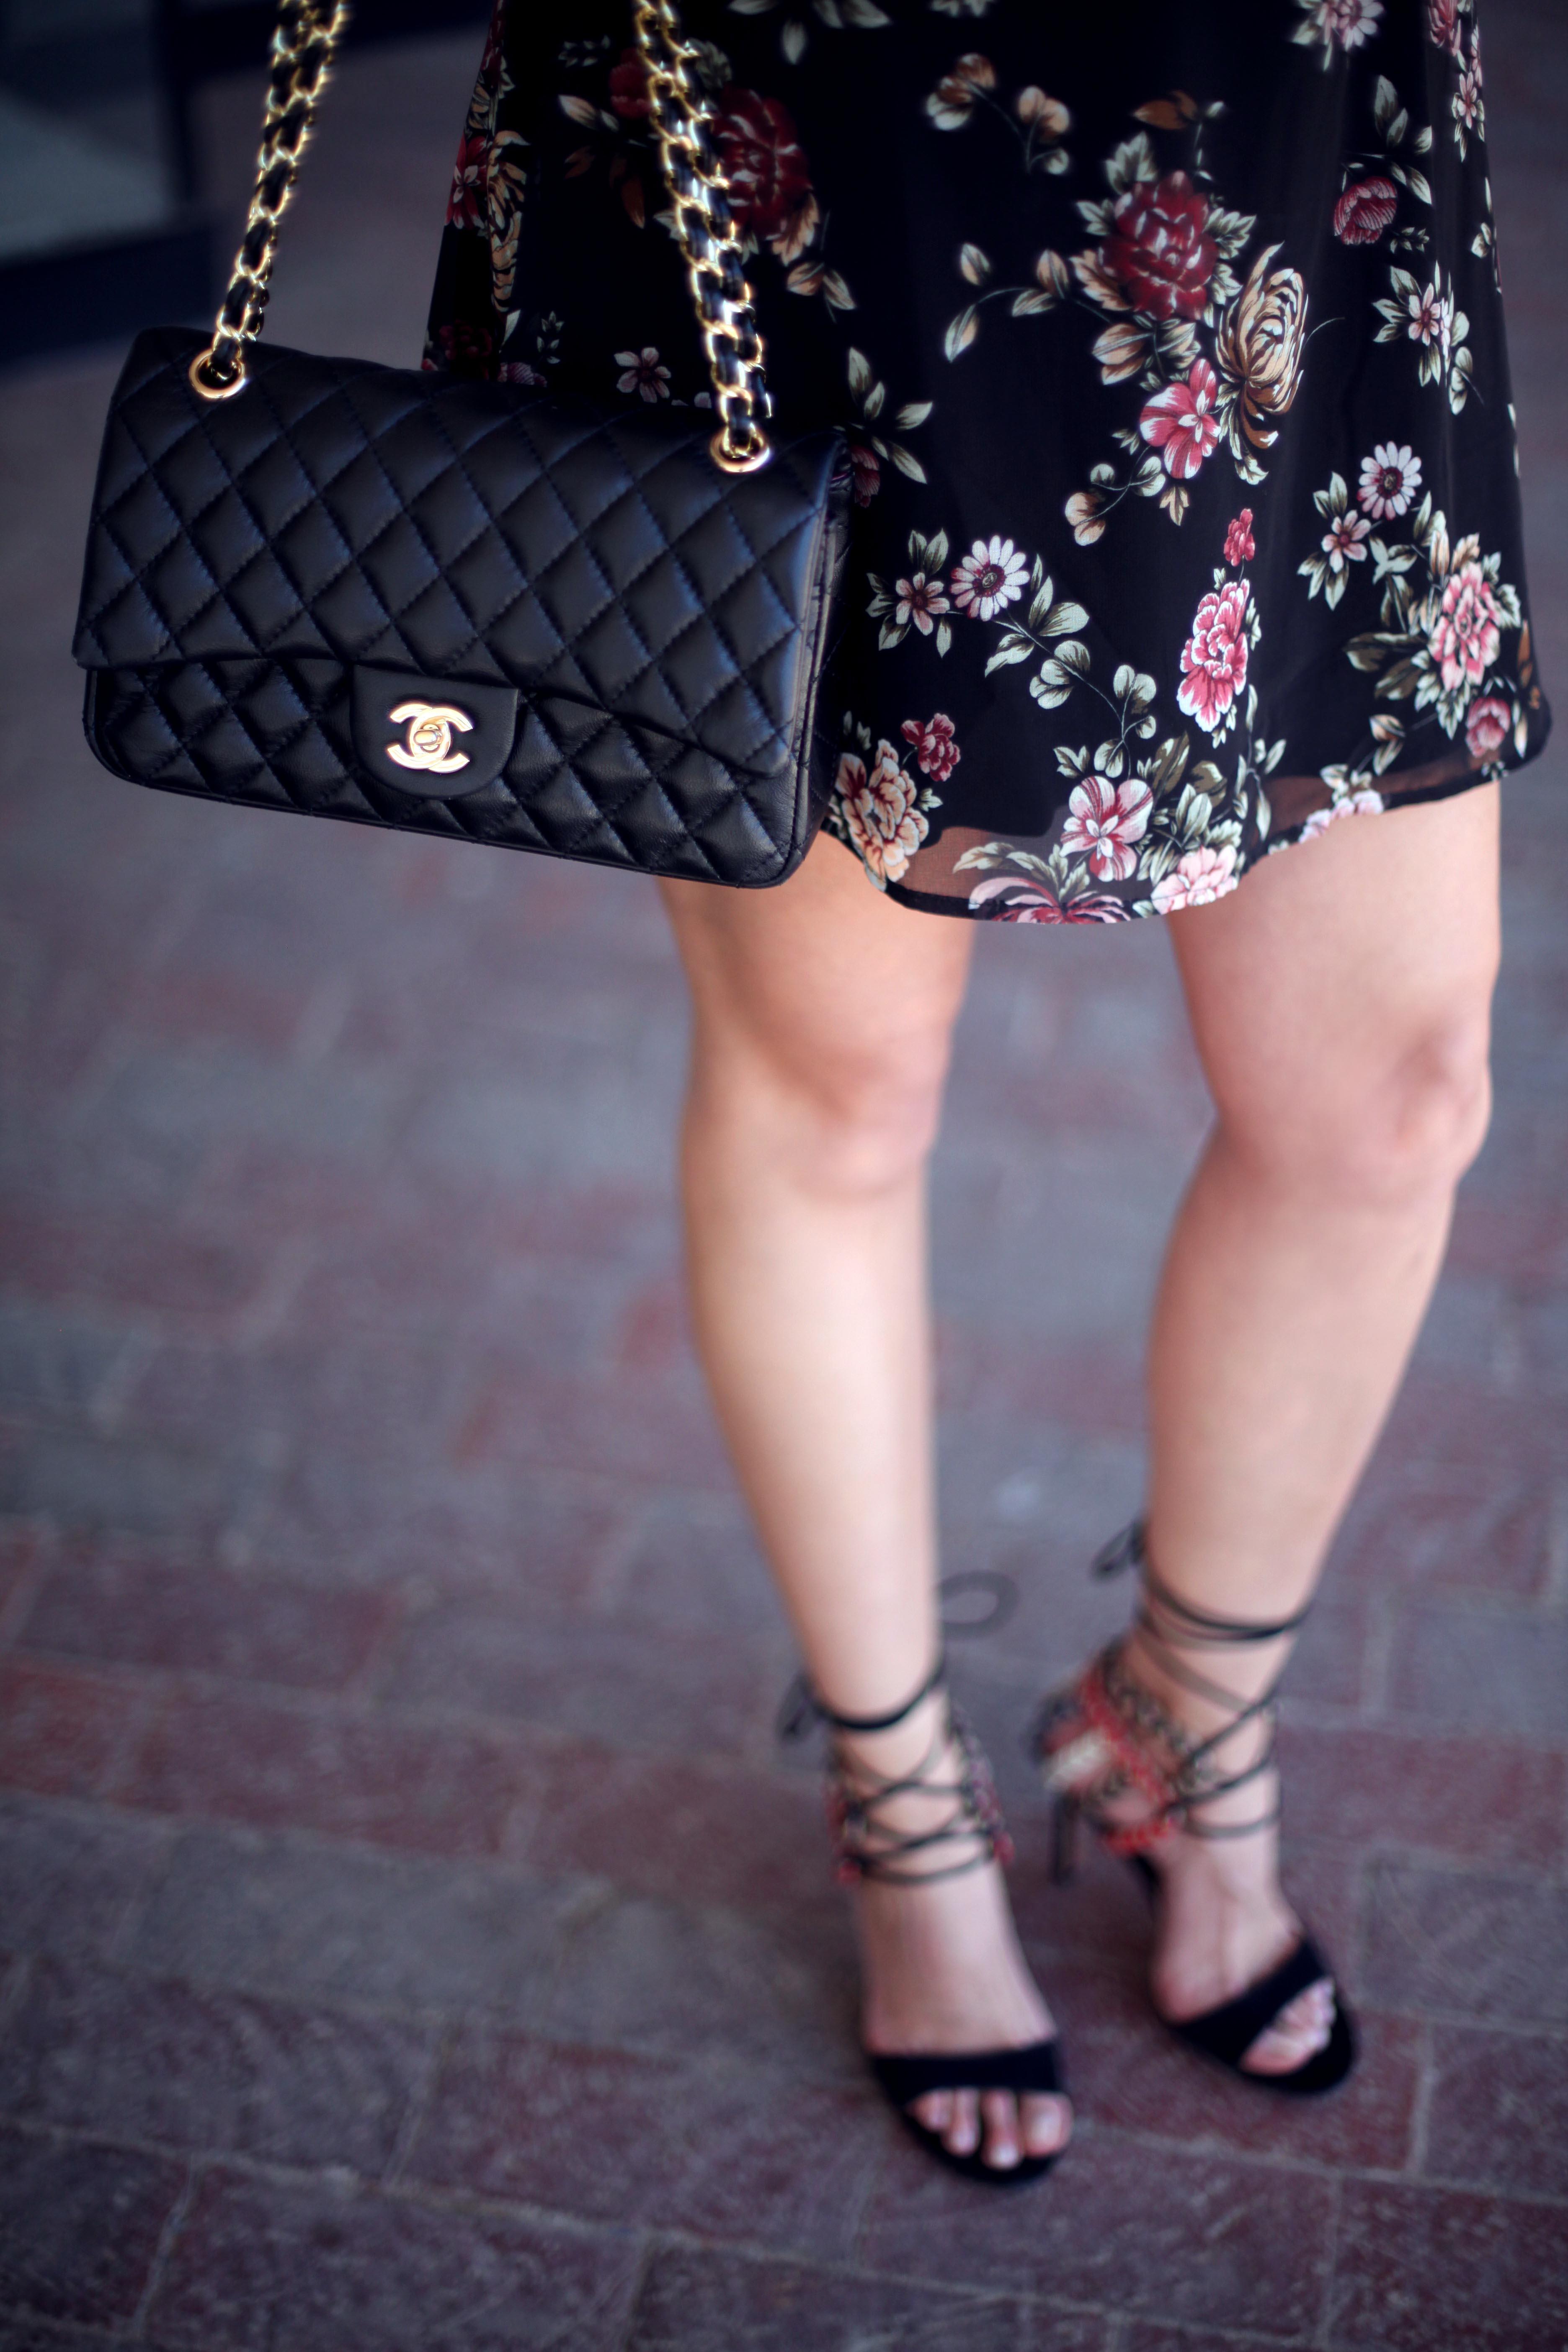 bailey-schneider-bohemian-style-lilikoi-heels-chanel-bag